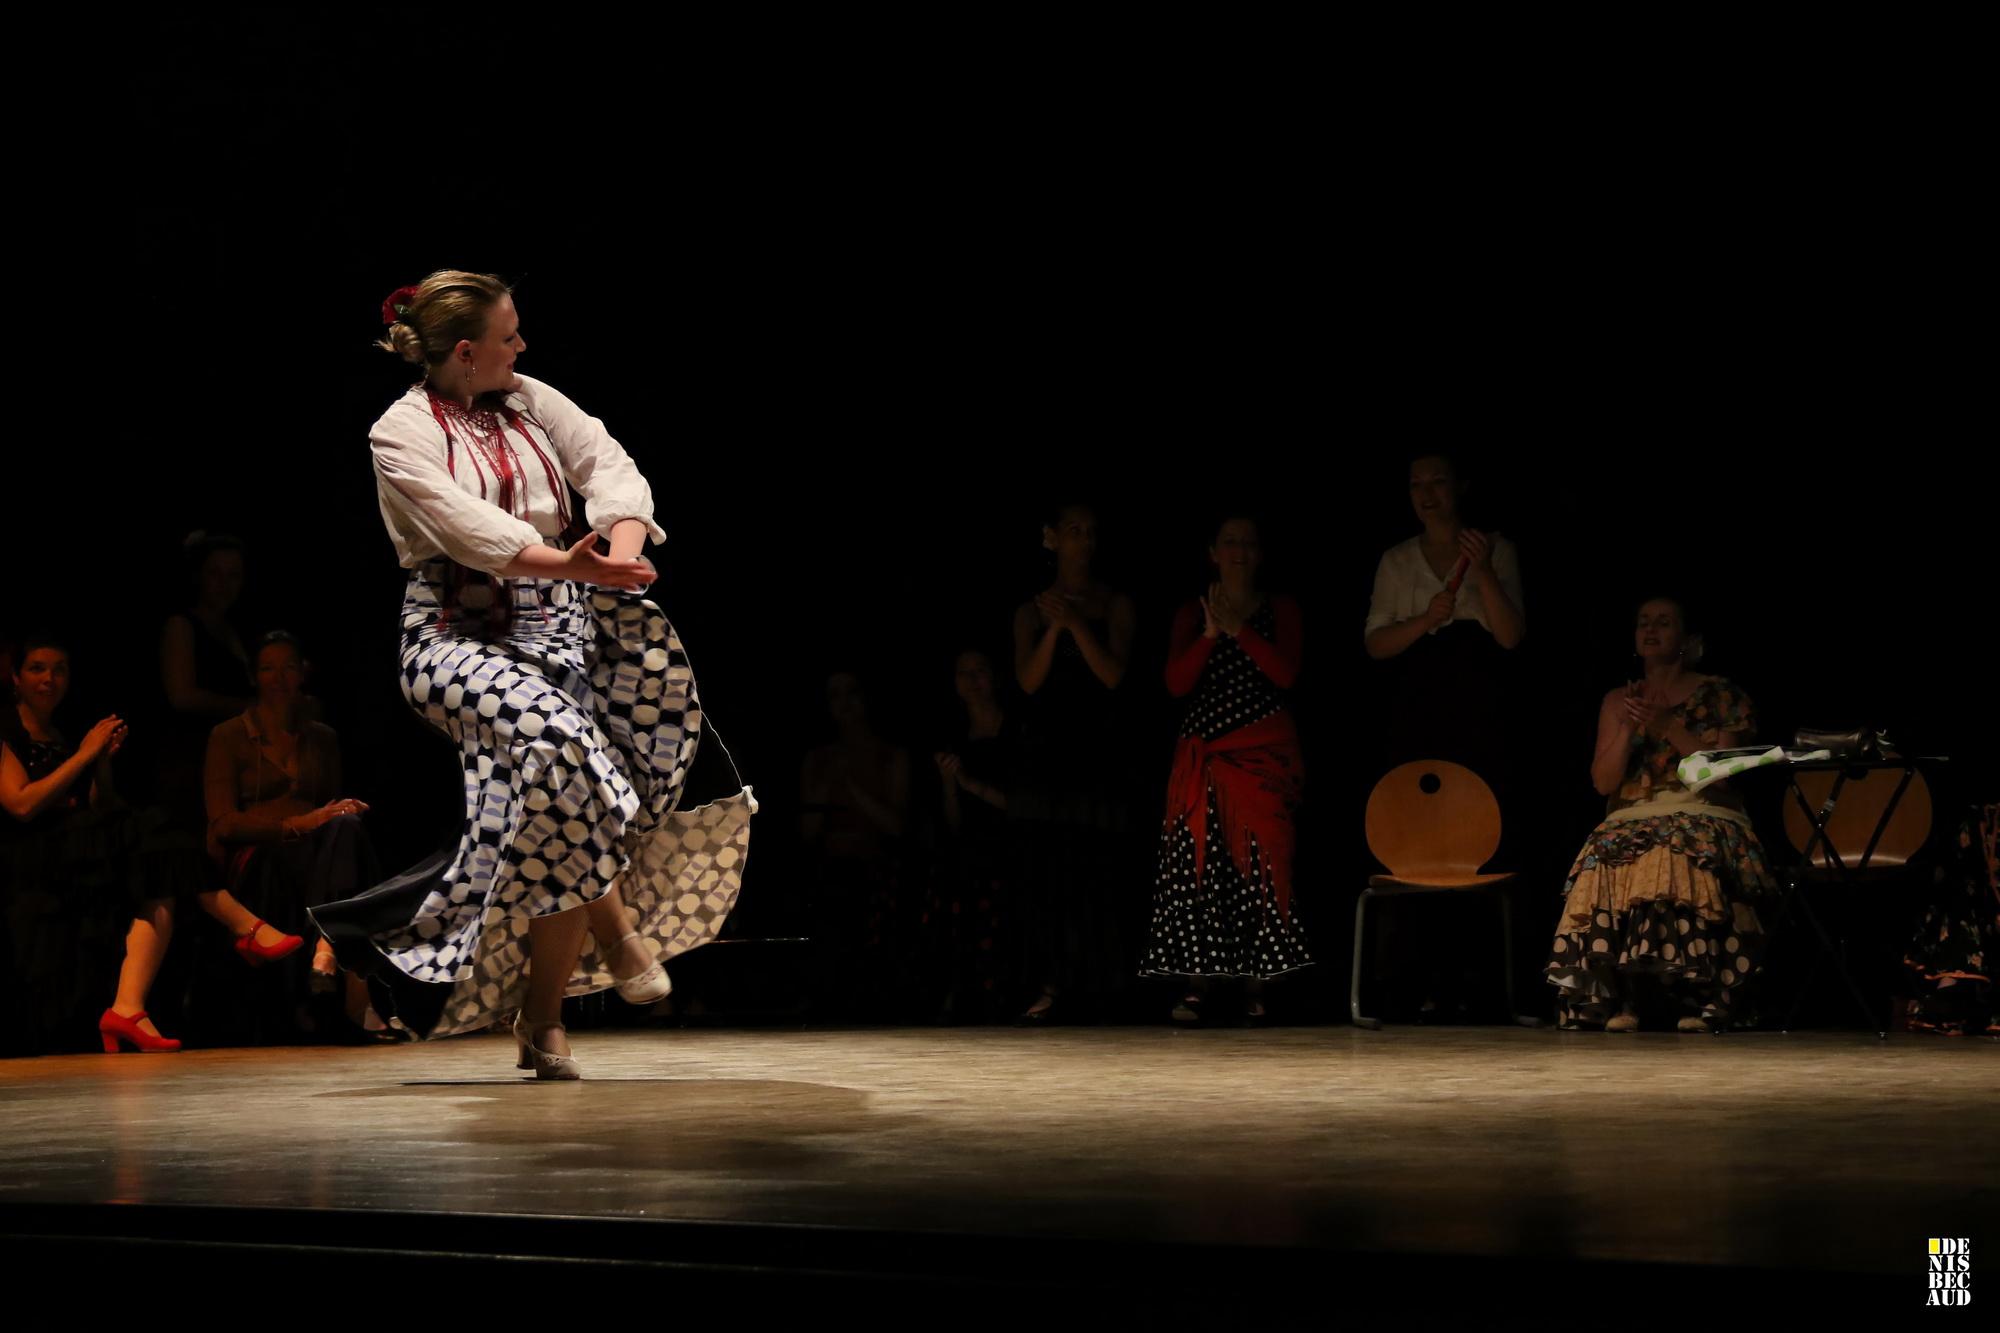 Pata de Buleria flamenco